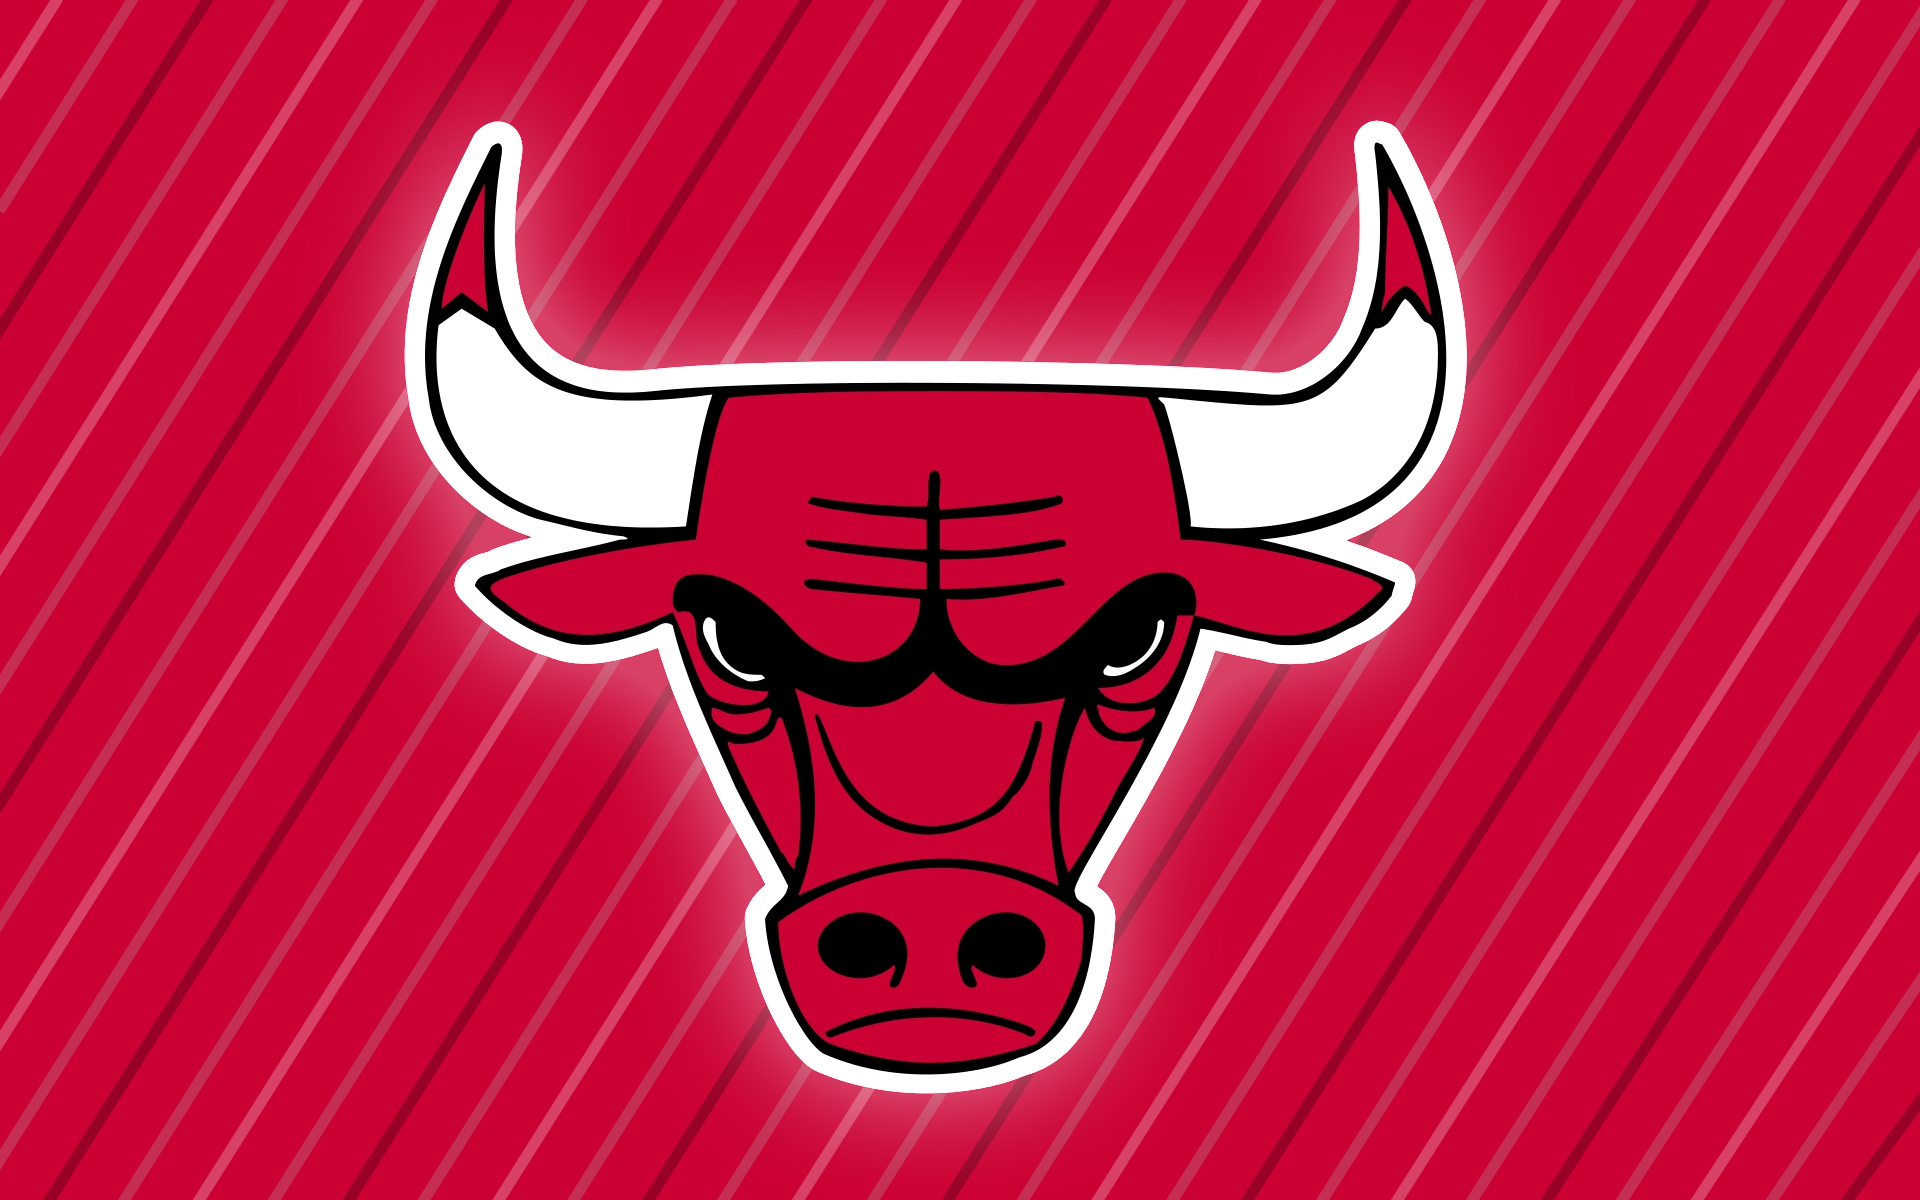 xoaqwepo chicago bulls logo wallpaper